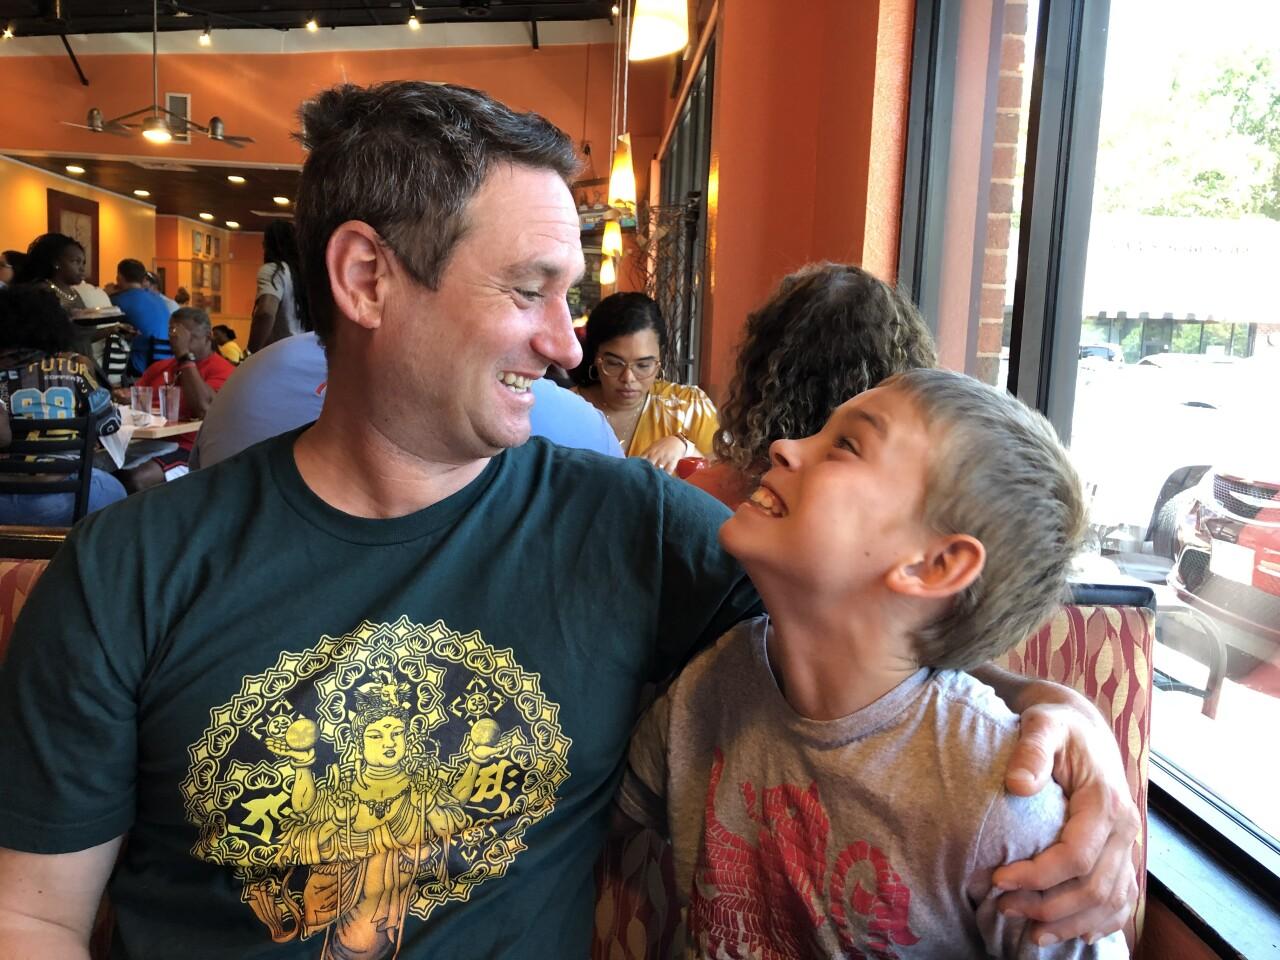 Chad Rosenbrock and son